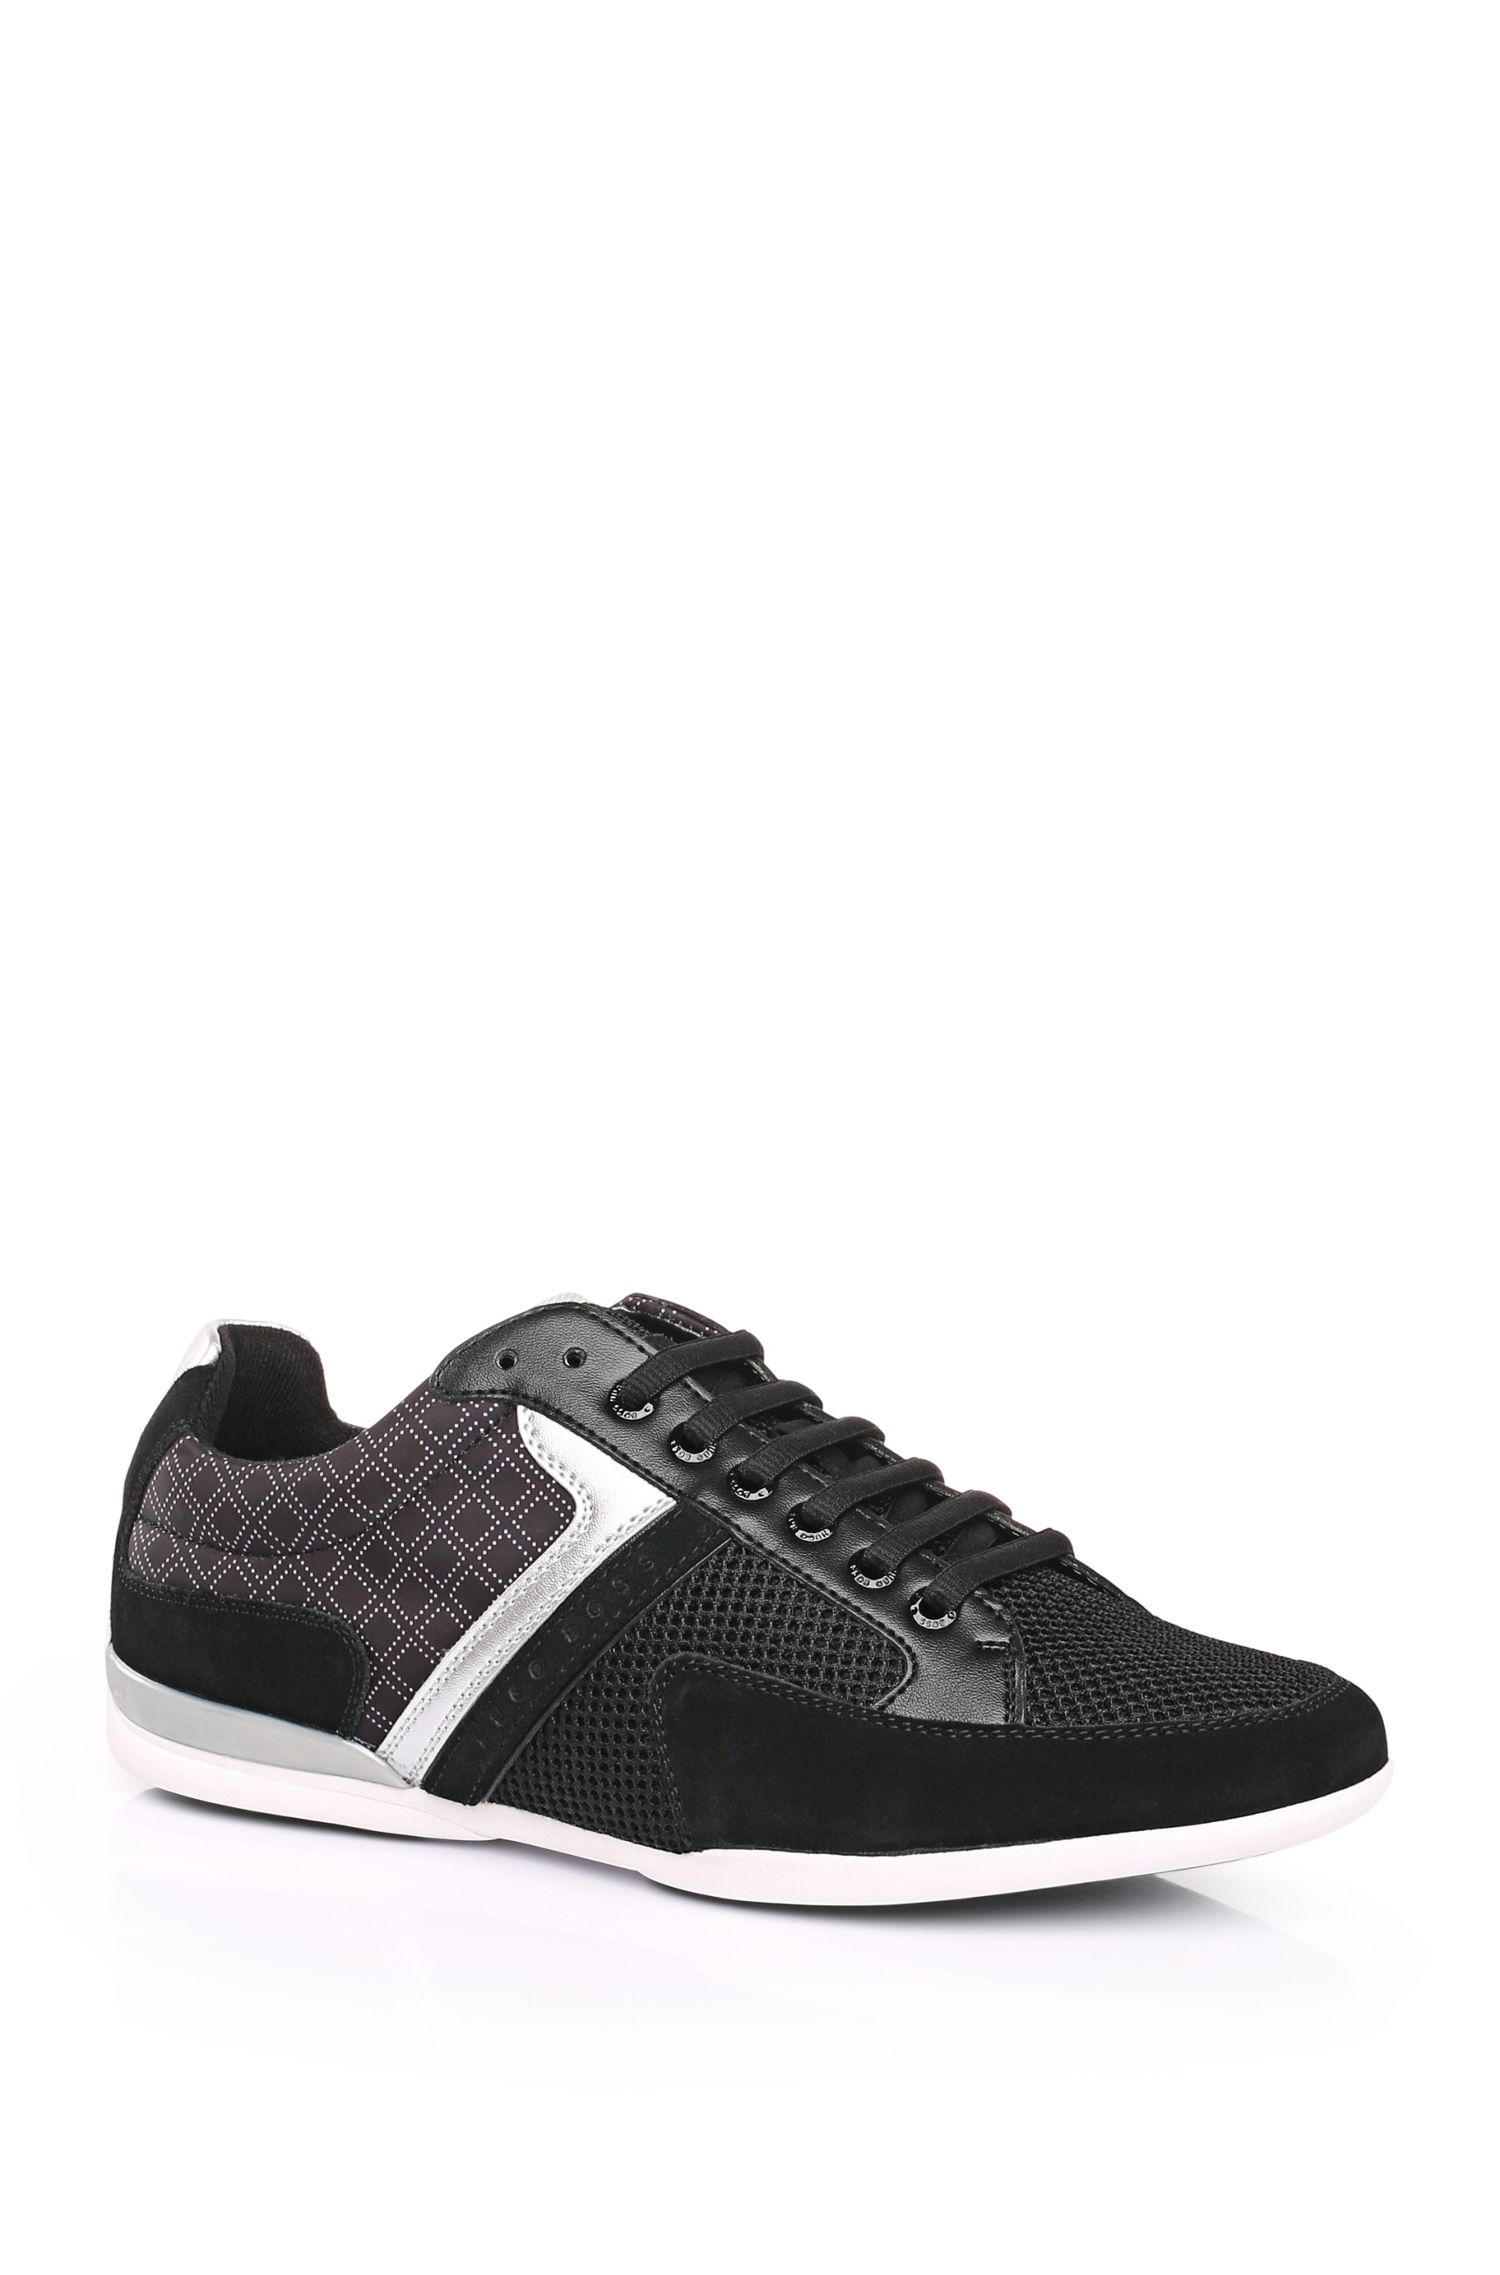 'Spacit Graphic' | Mesh Upper Sneakers